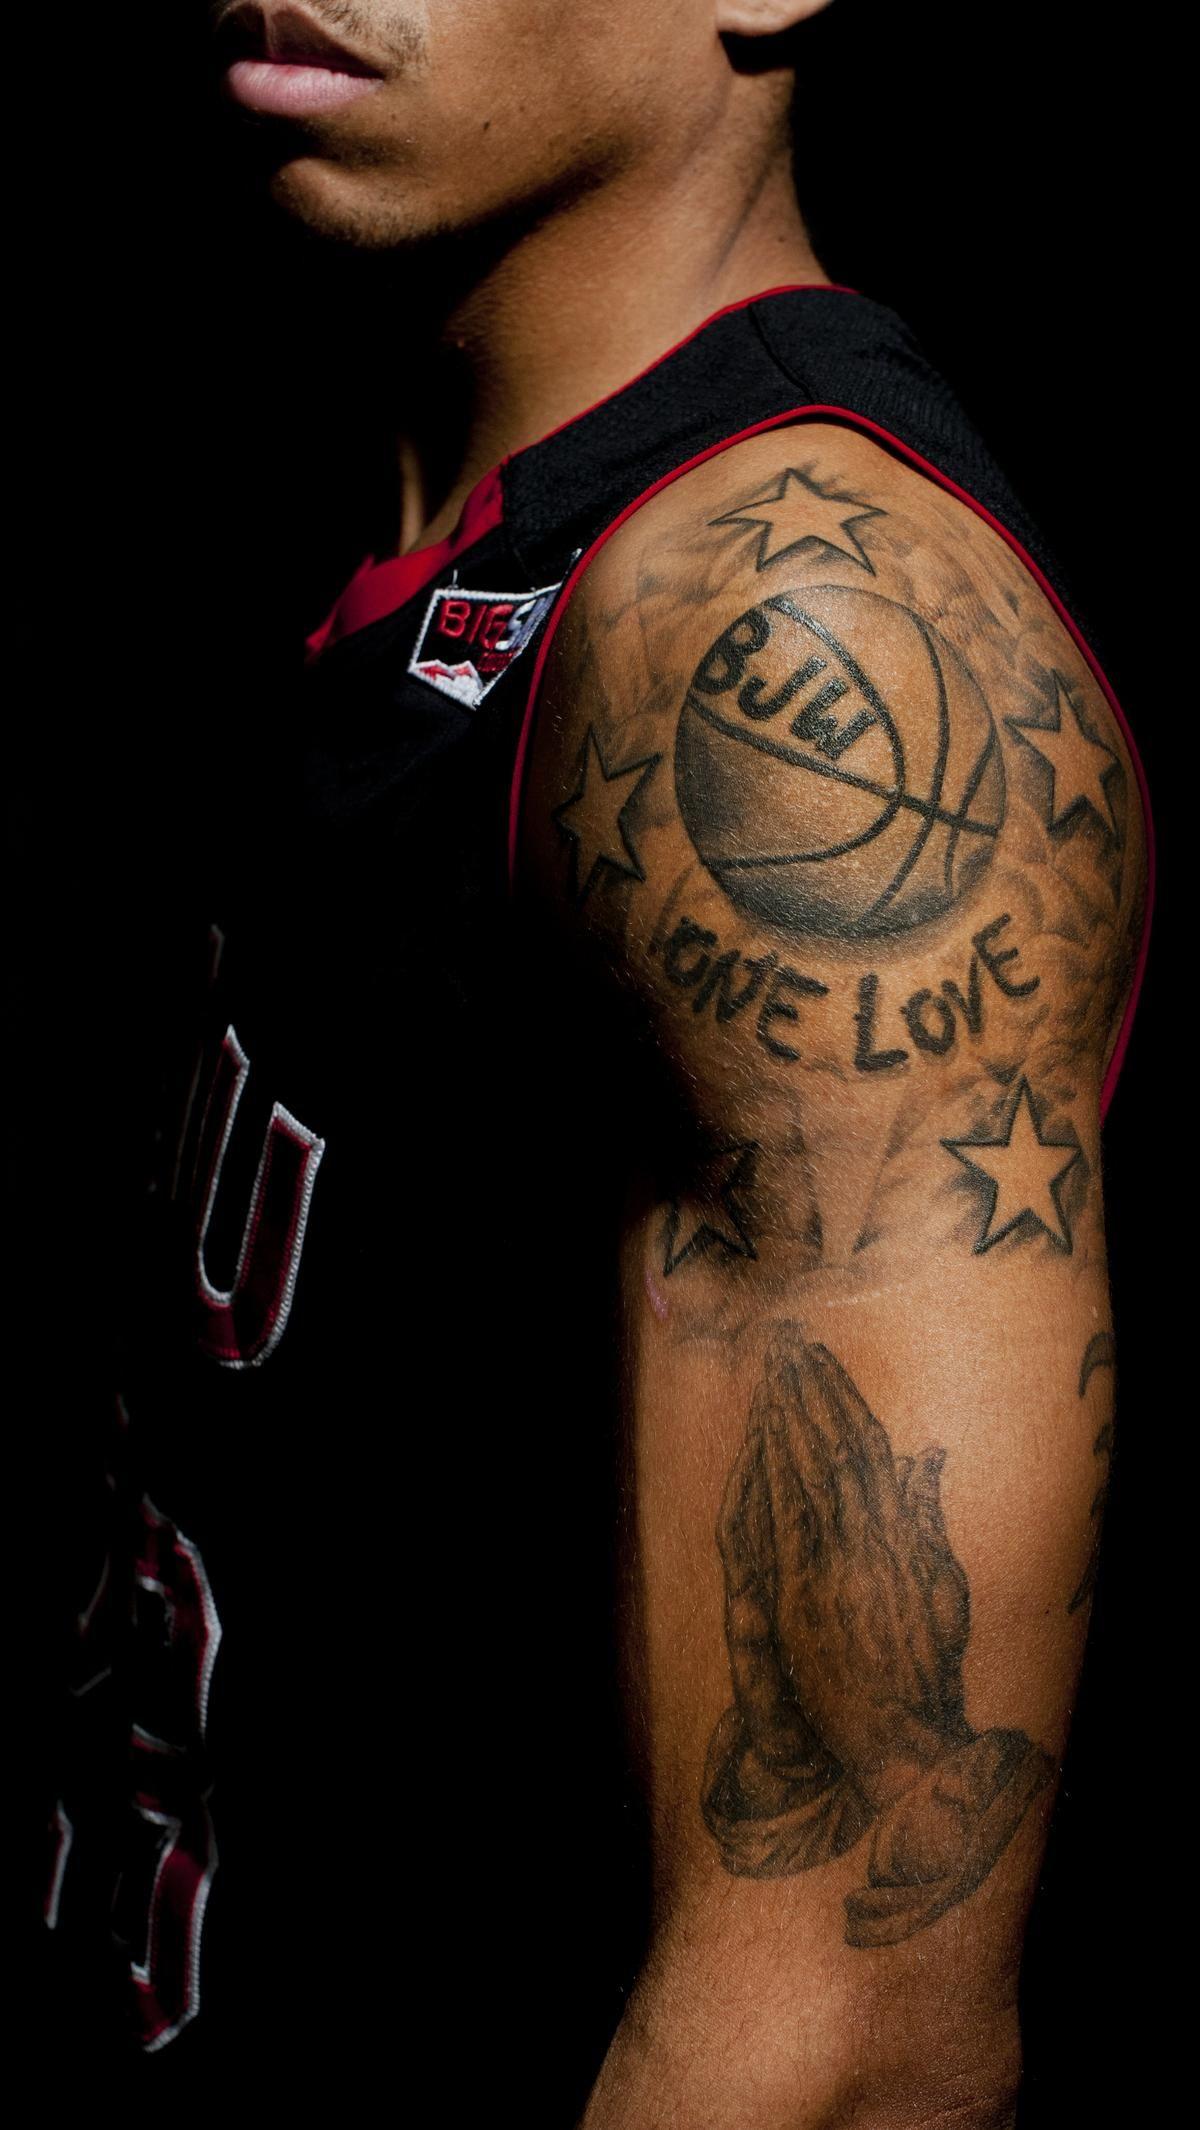 Basketball players tattoos share lives feelings The